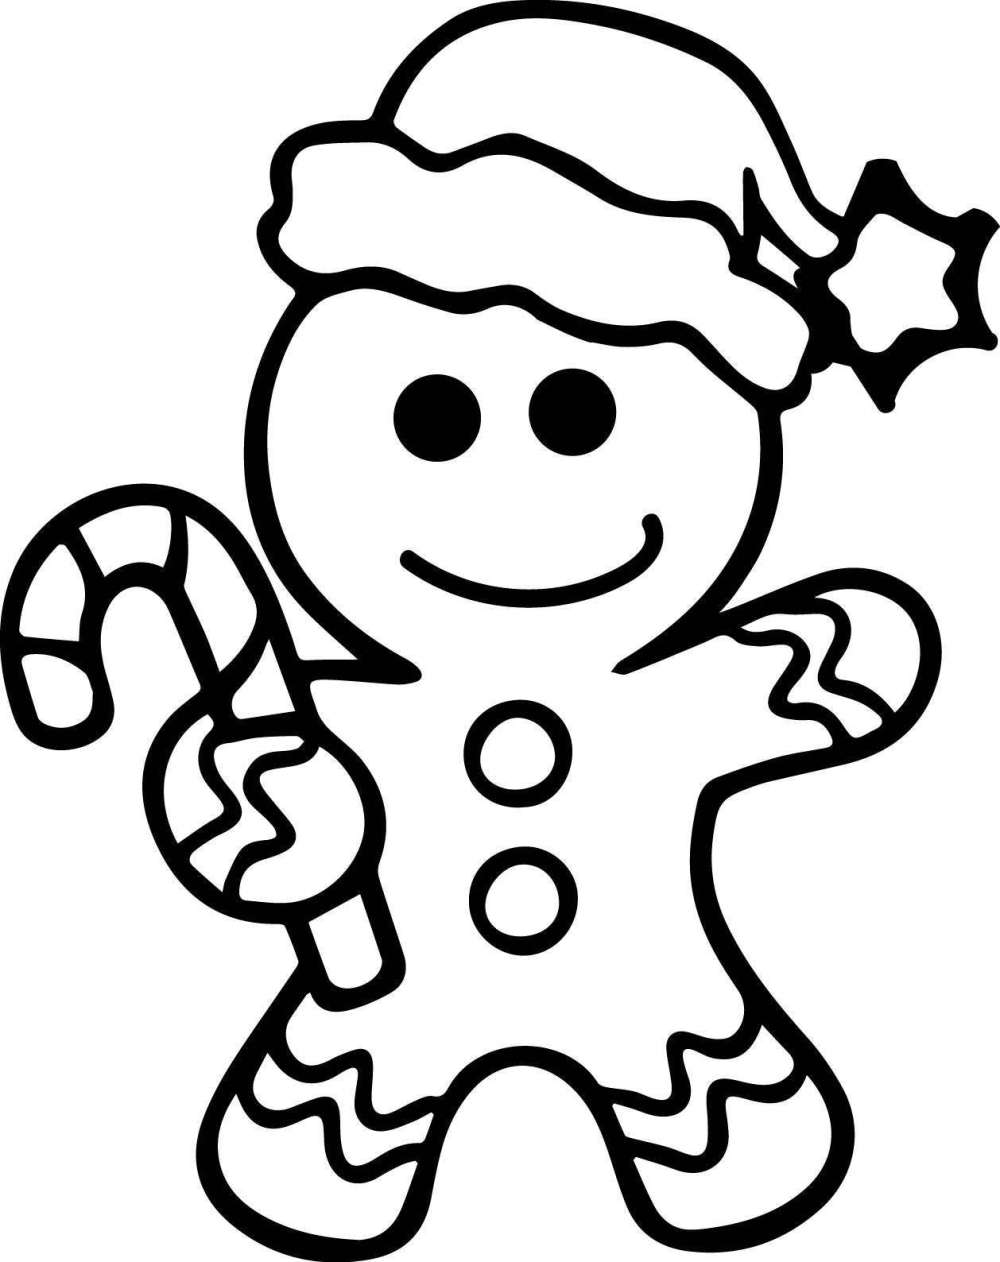 medium resolution of 1258x1588 christmas lights coloring pages printable with thomas edison light thomas edison light bulb drawing